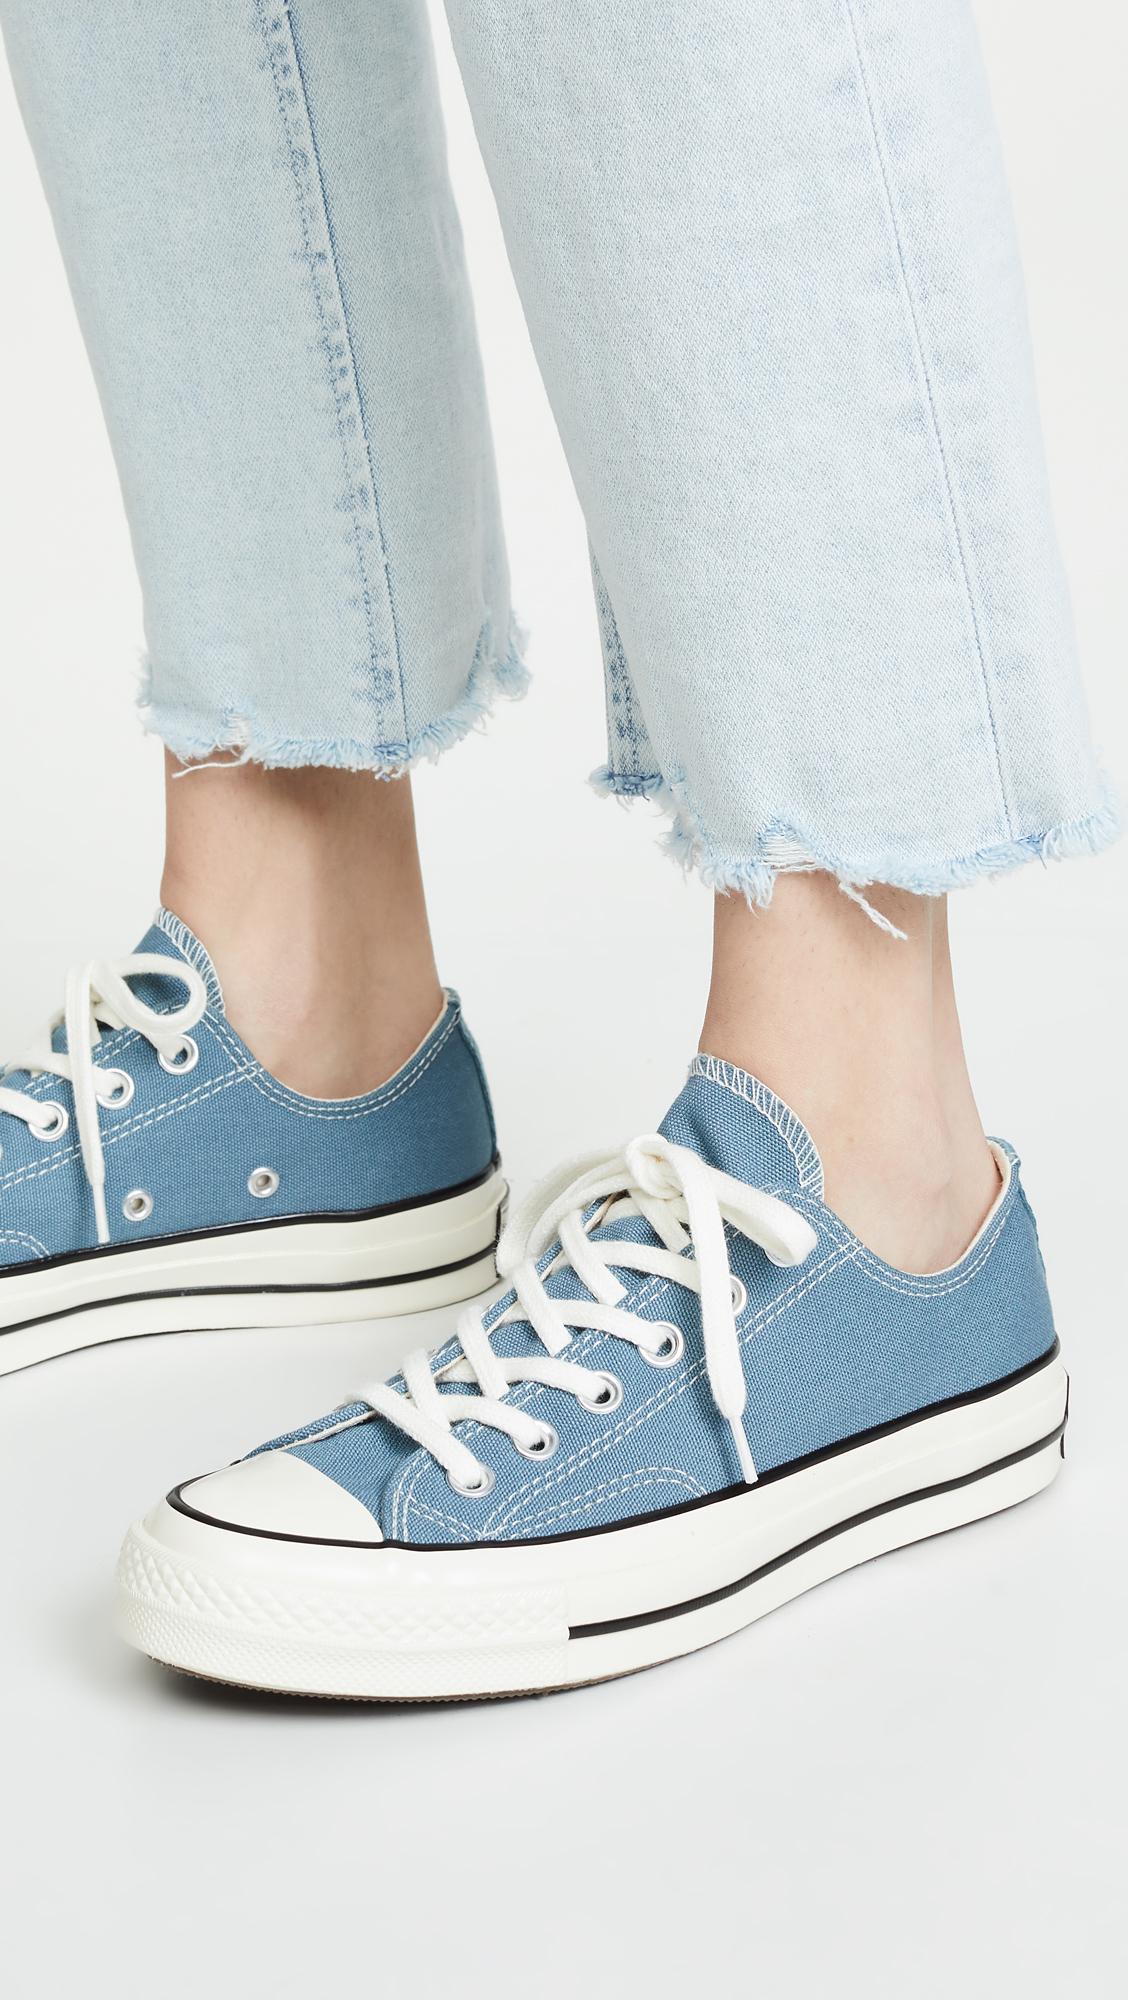 c51f570cd0c9 Converse - Blue Chuck  70s Vintage Ox Sneakers - Lyst. View fullscreen